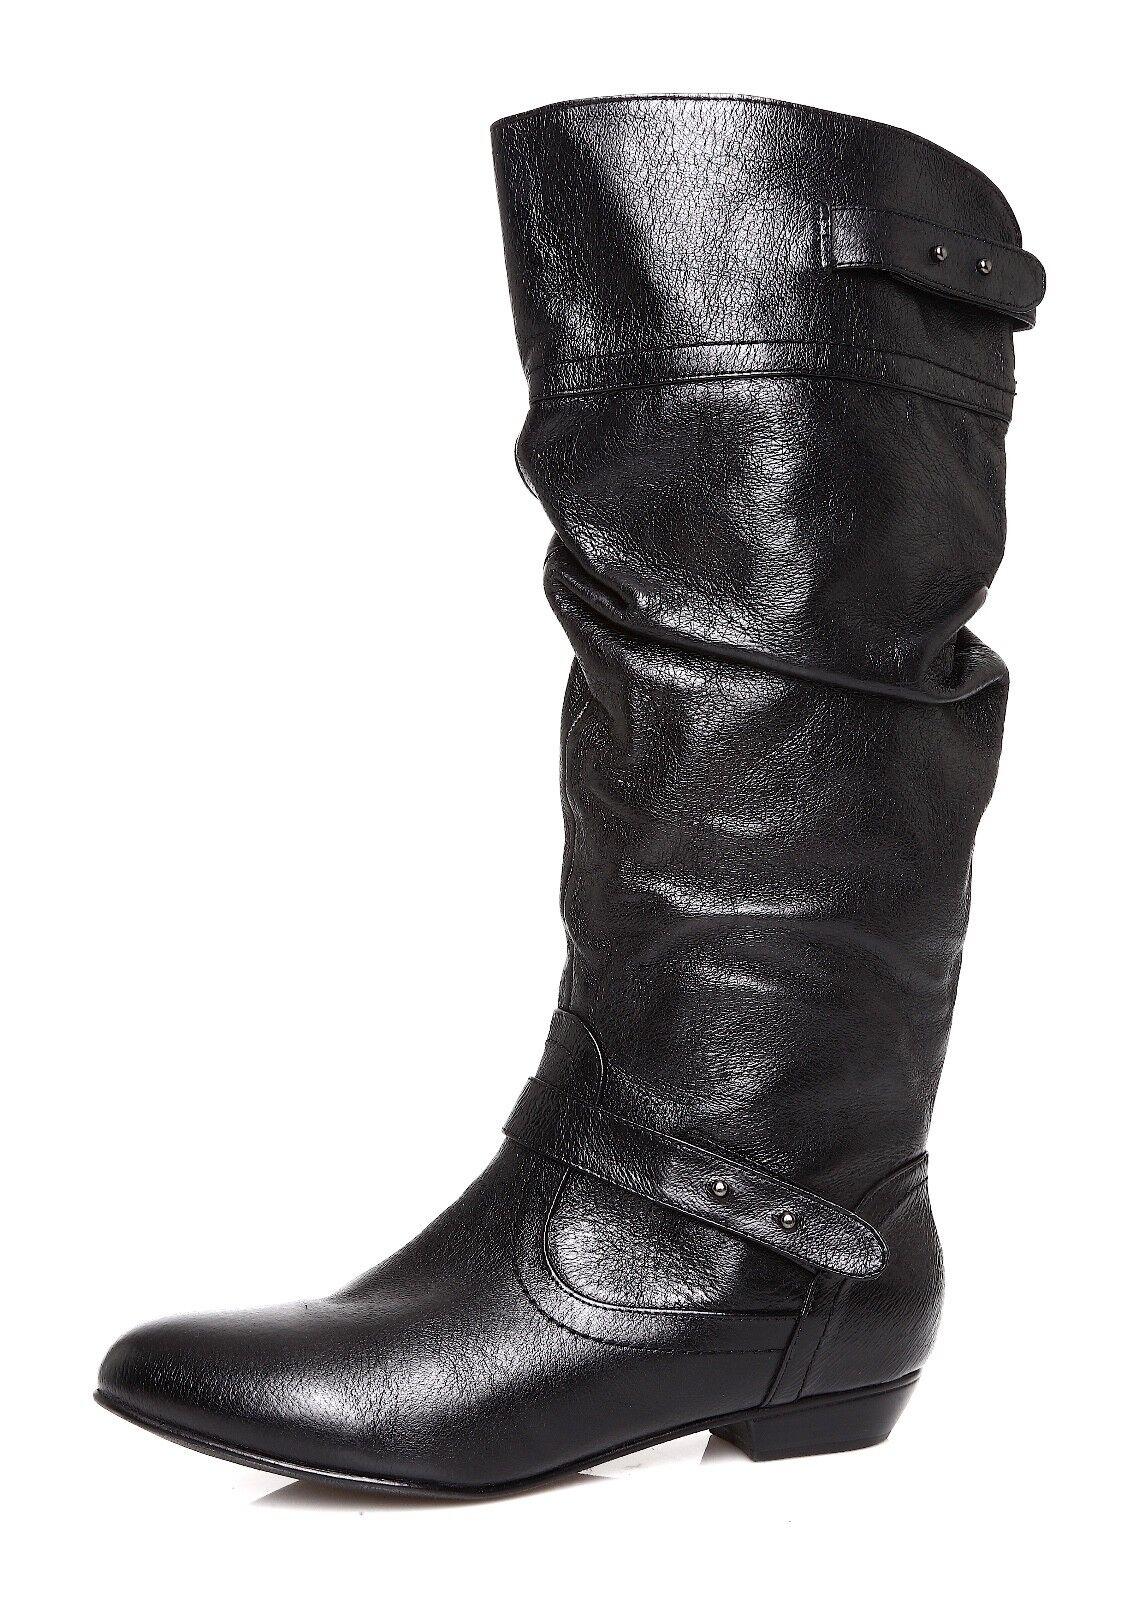 Steve Madden Kikiii Women's Black Leather Boot Sz 7.5 M 4483 *